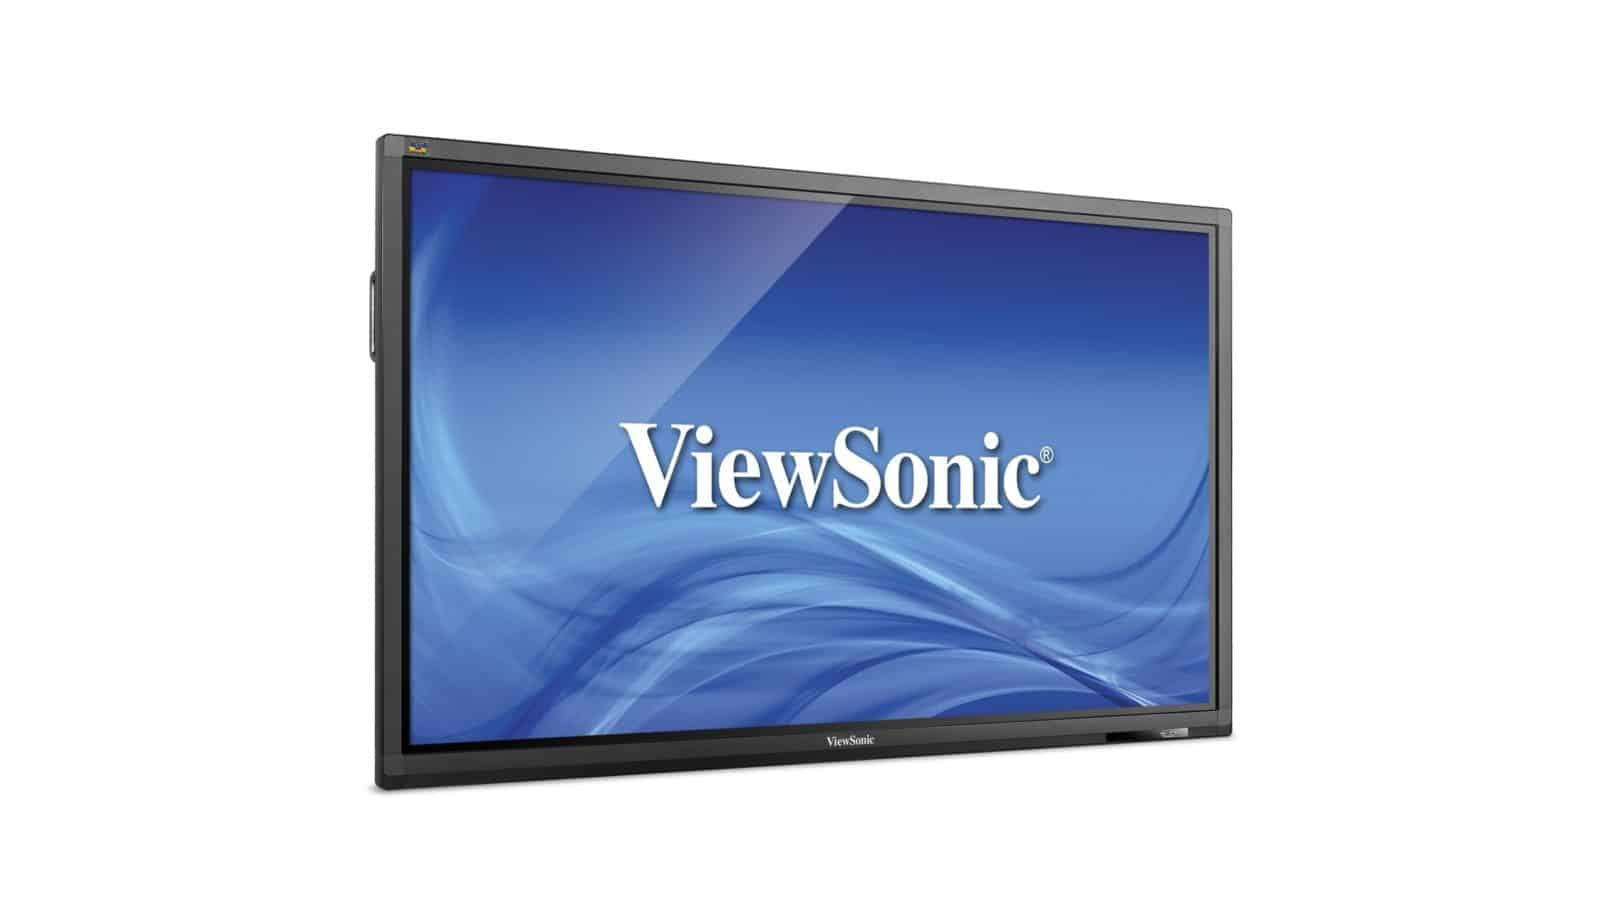 ViewSonic 4K Display $19,000